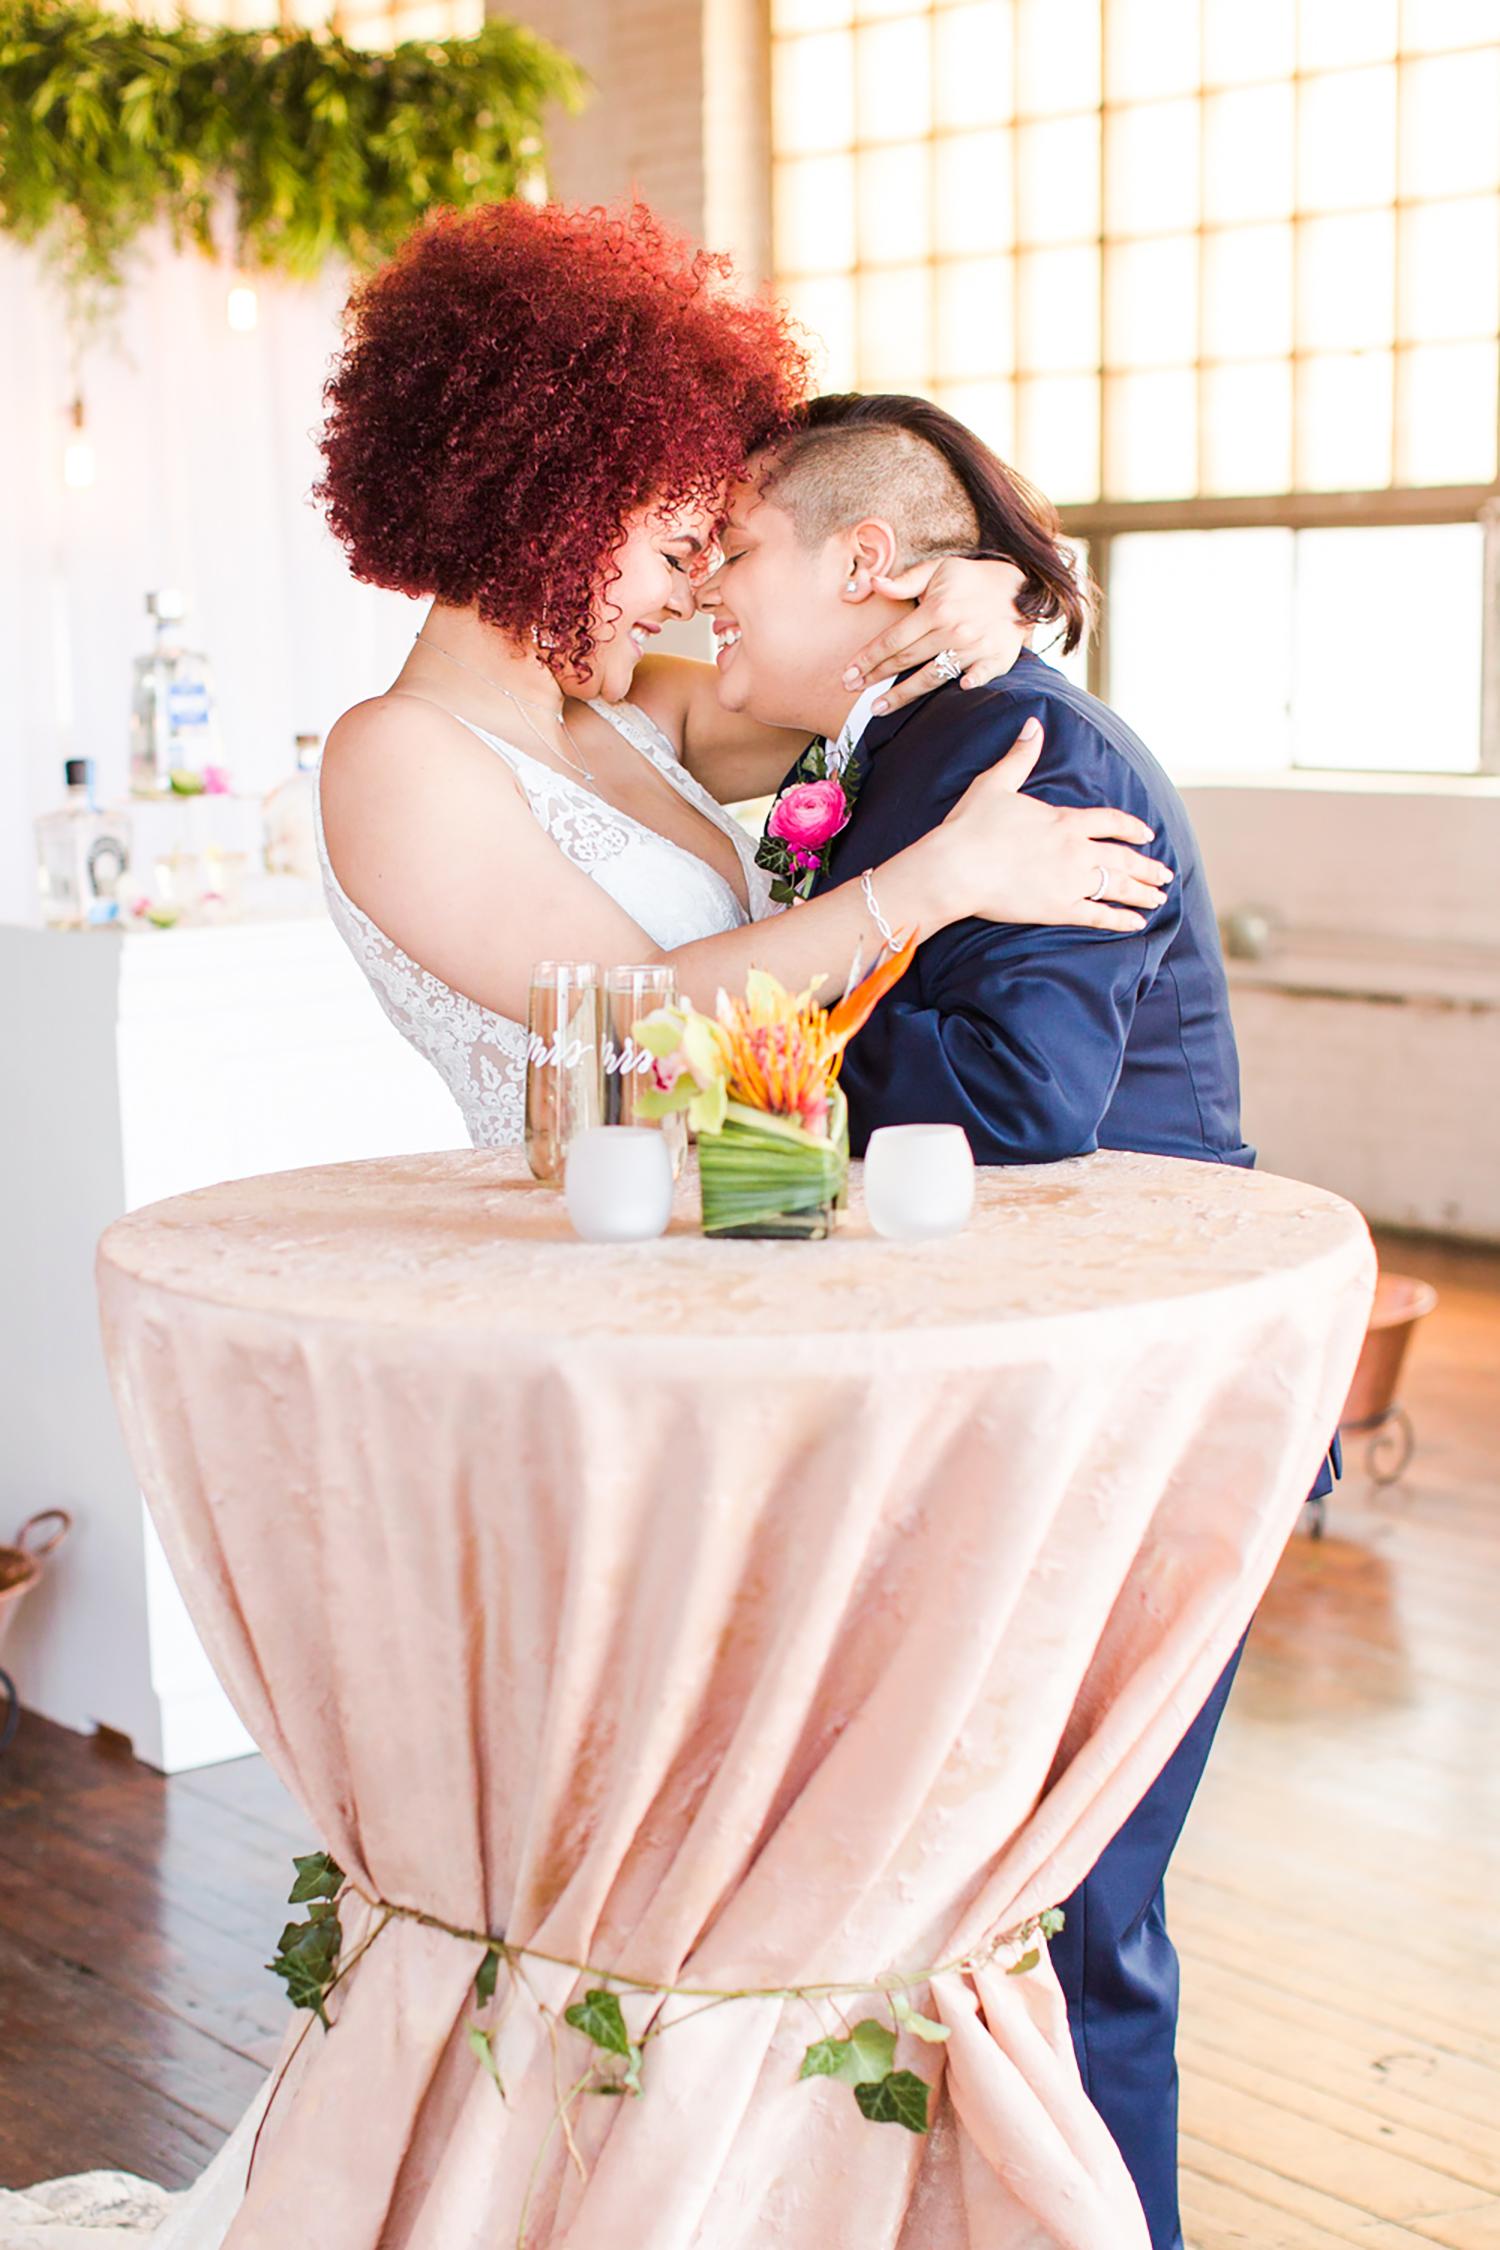 tropical-wedding-inspiration-ct-wedding-planner-16.jpg